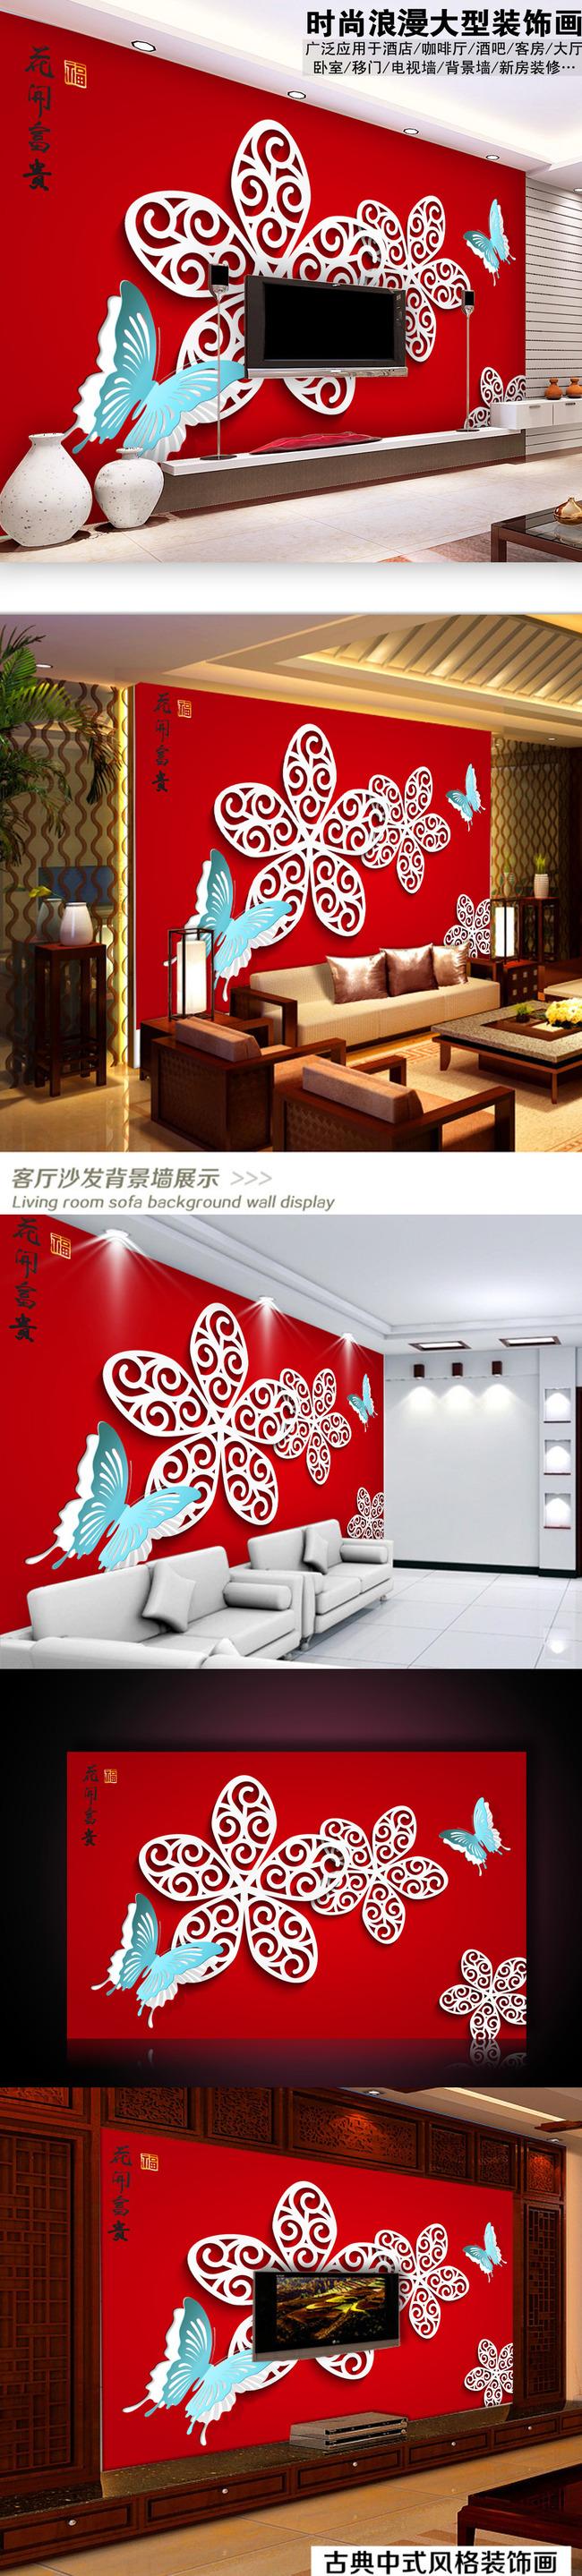 3d立体新春蝴蝶花朵剪纸背景墙